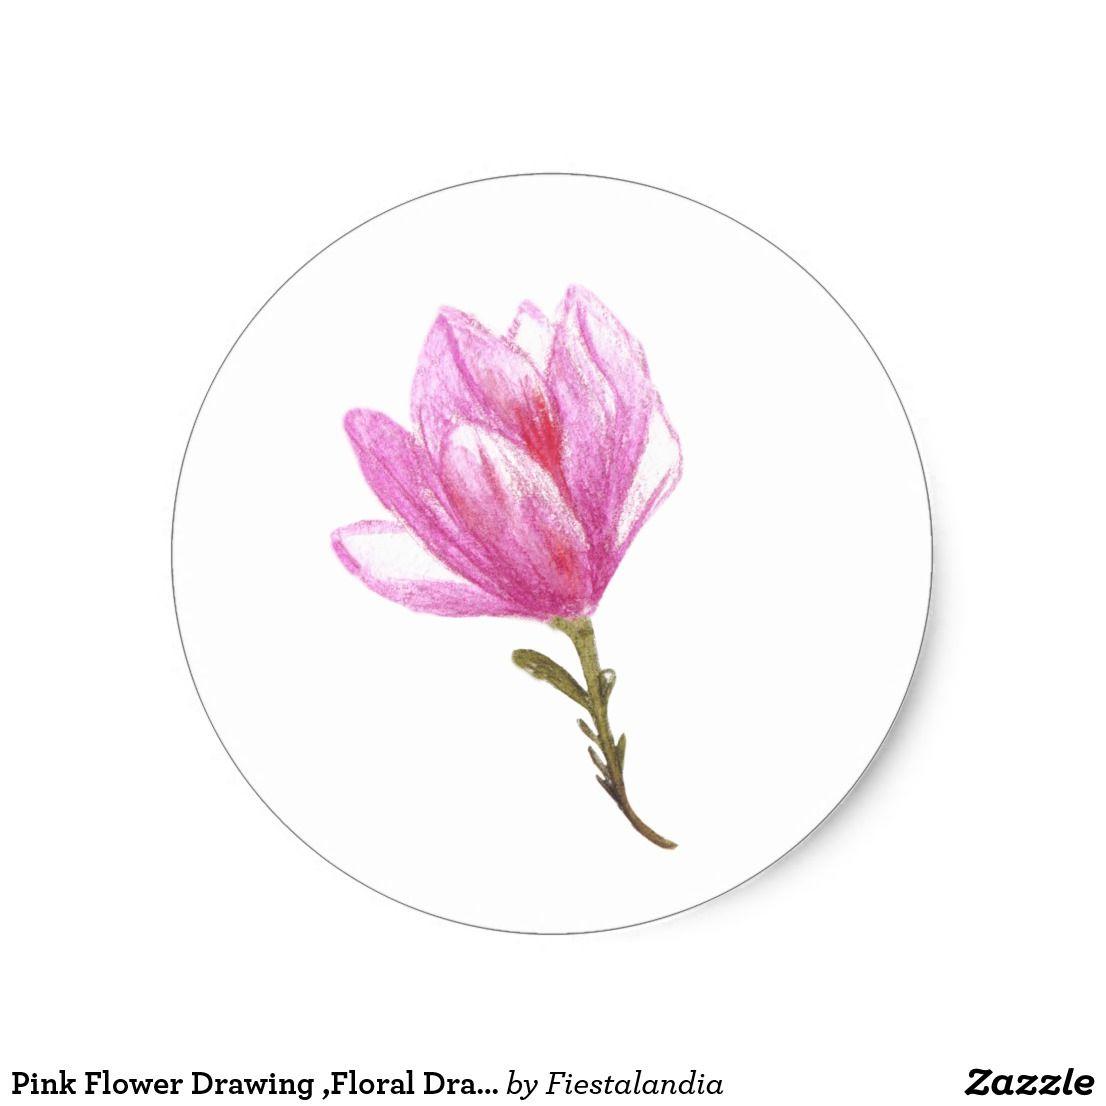 Pink flower drawing floral drawing sticker floral drawing flower pink flower drawing floral drawing sticker mightylinksfo